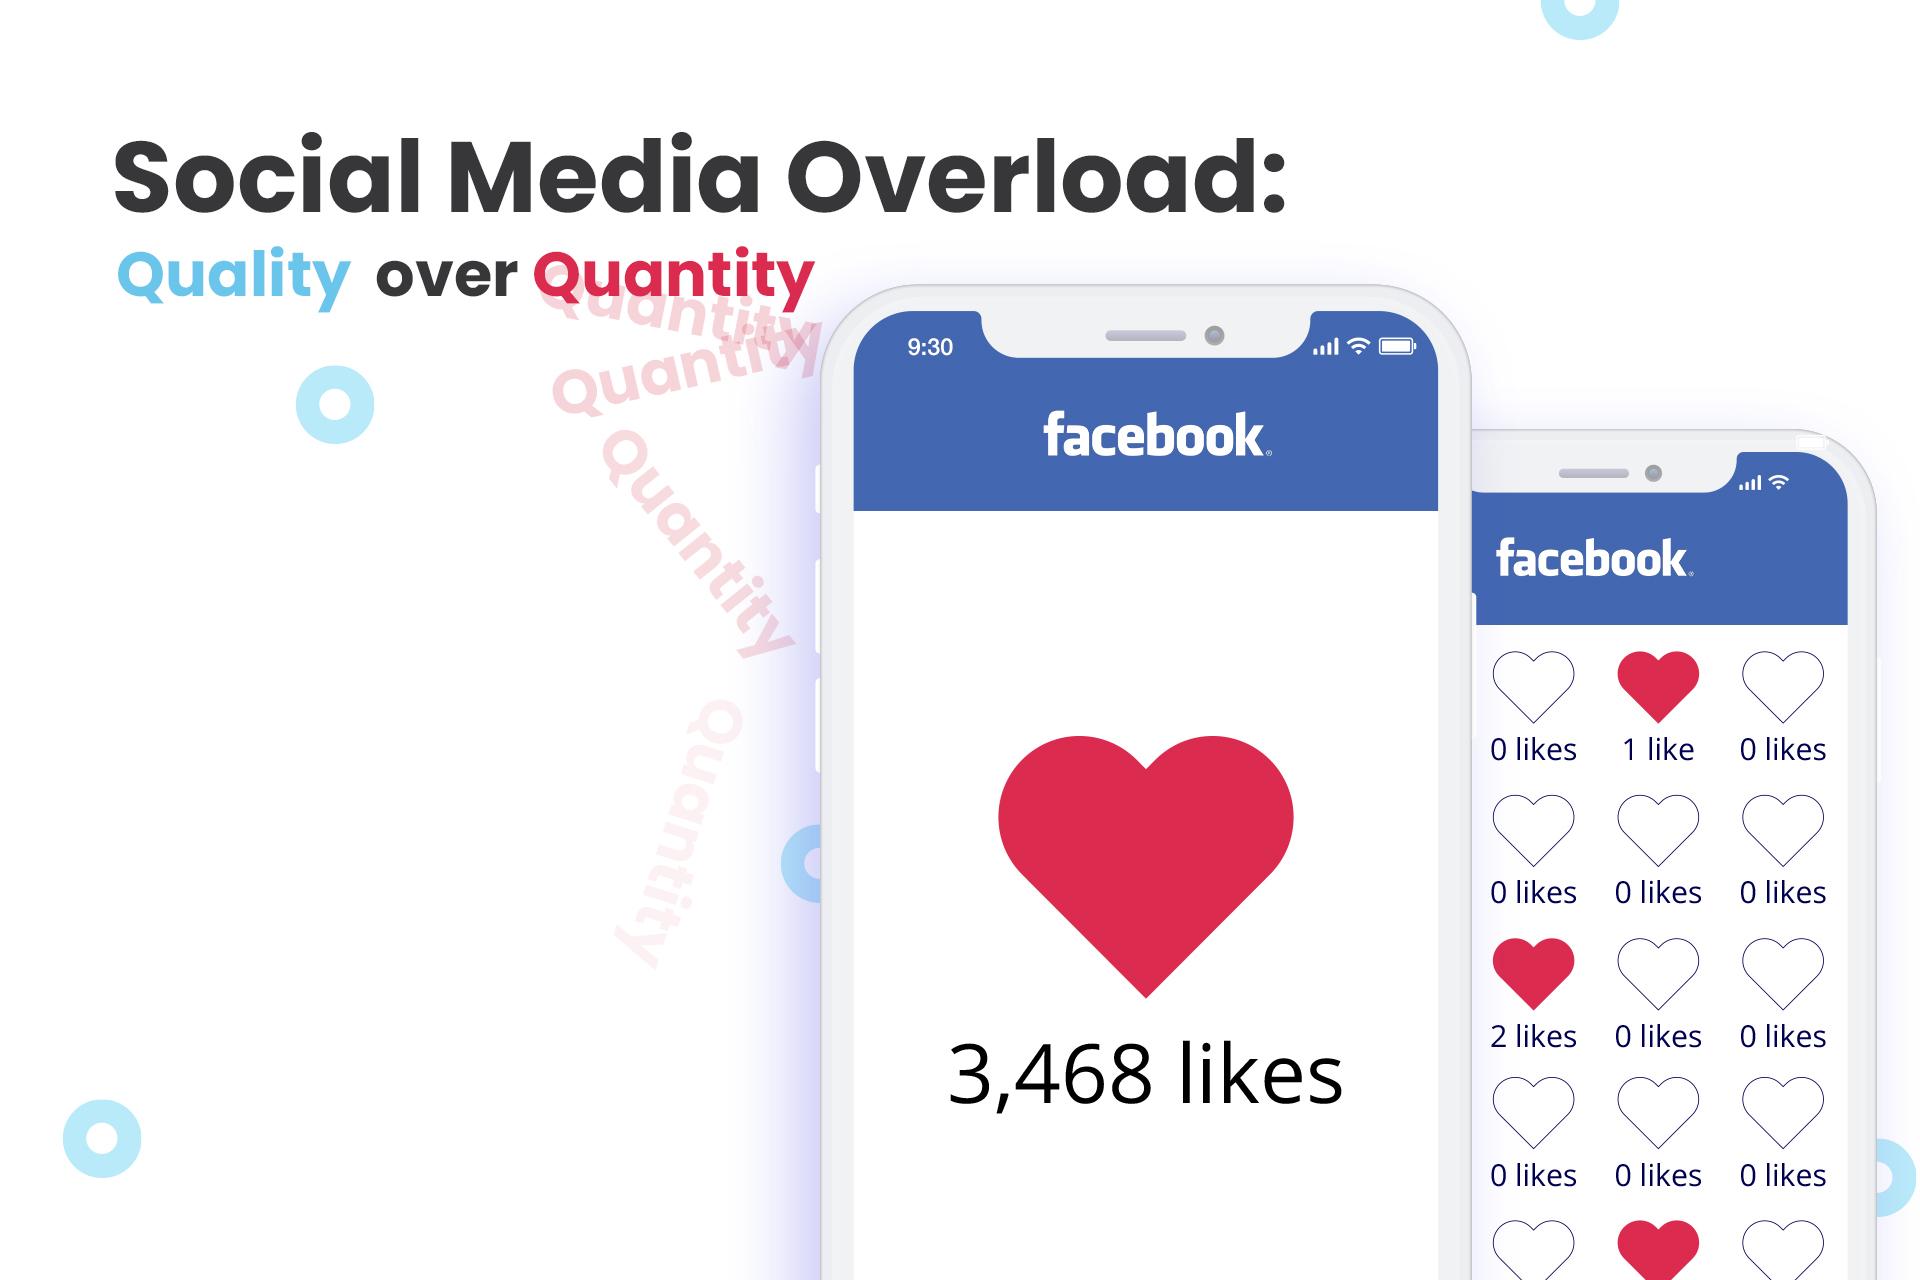 Social media overload: Quality over quantity